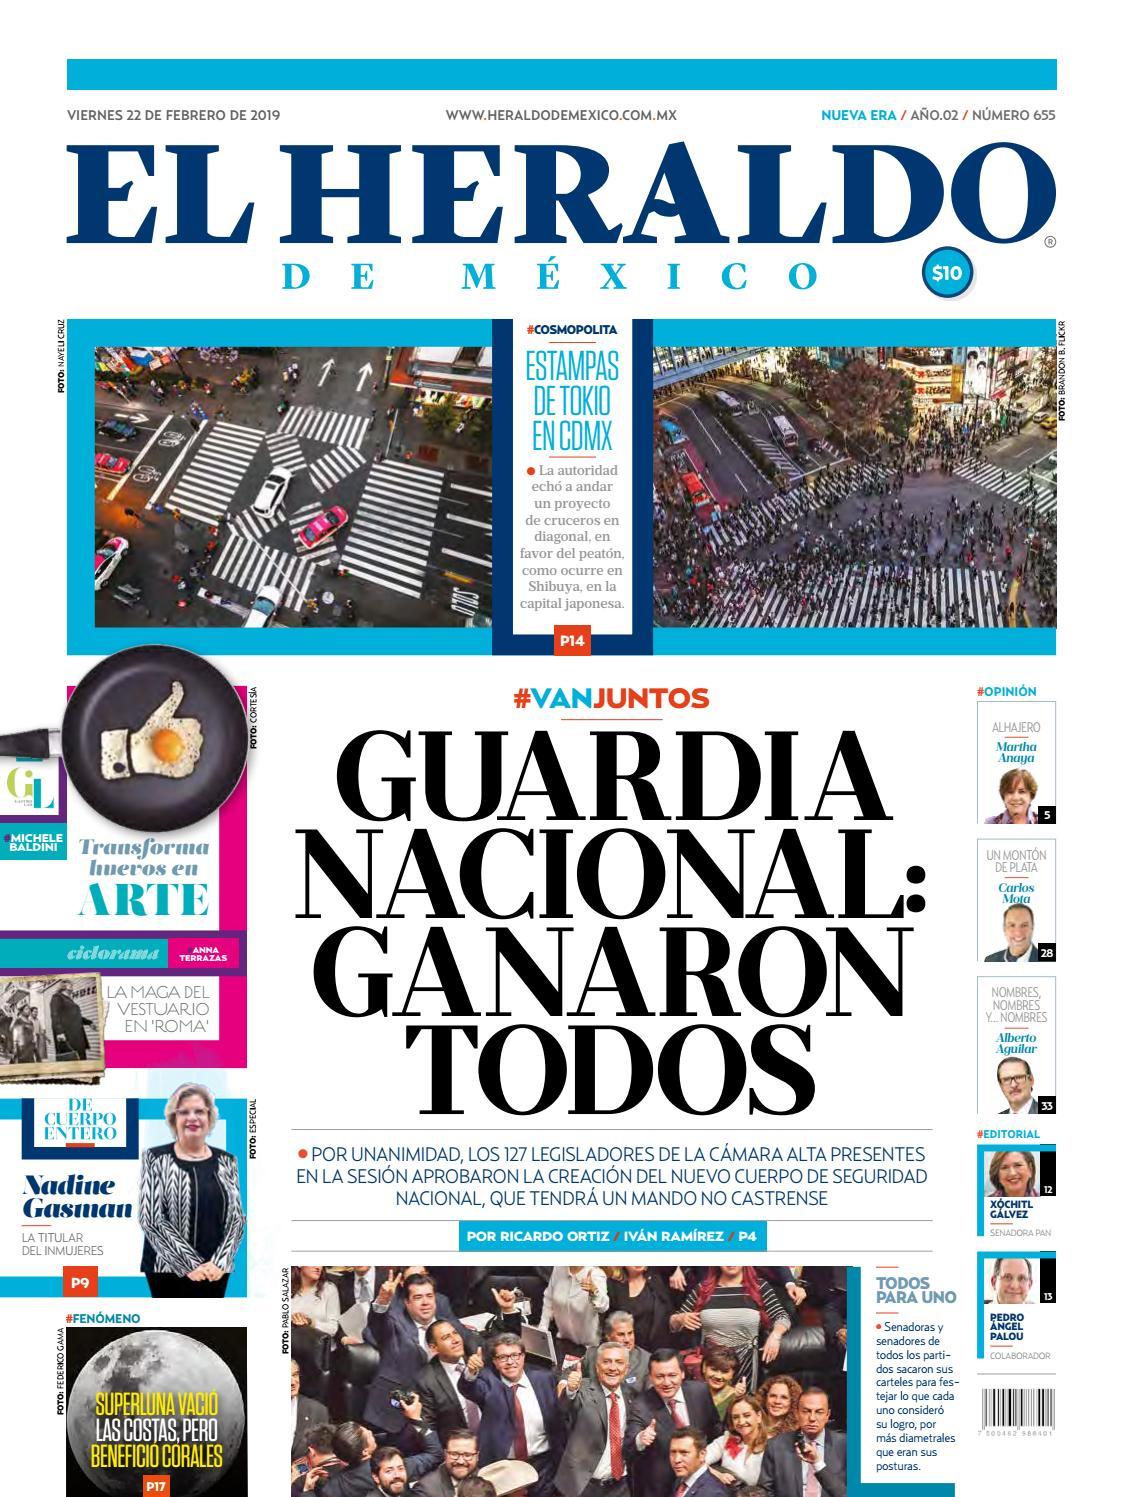 a0a1ea1a5 22 de febrero de 2019 by El Heraldo de México - issuu